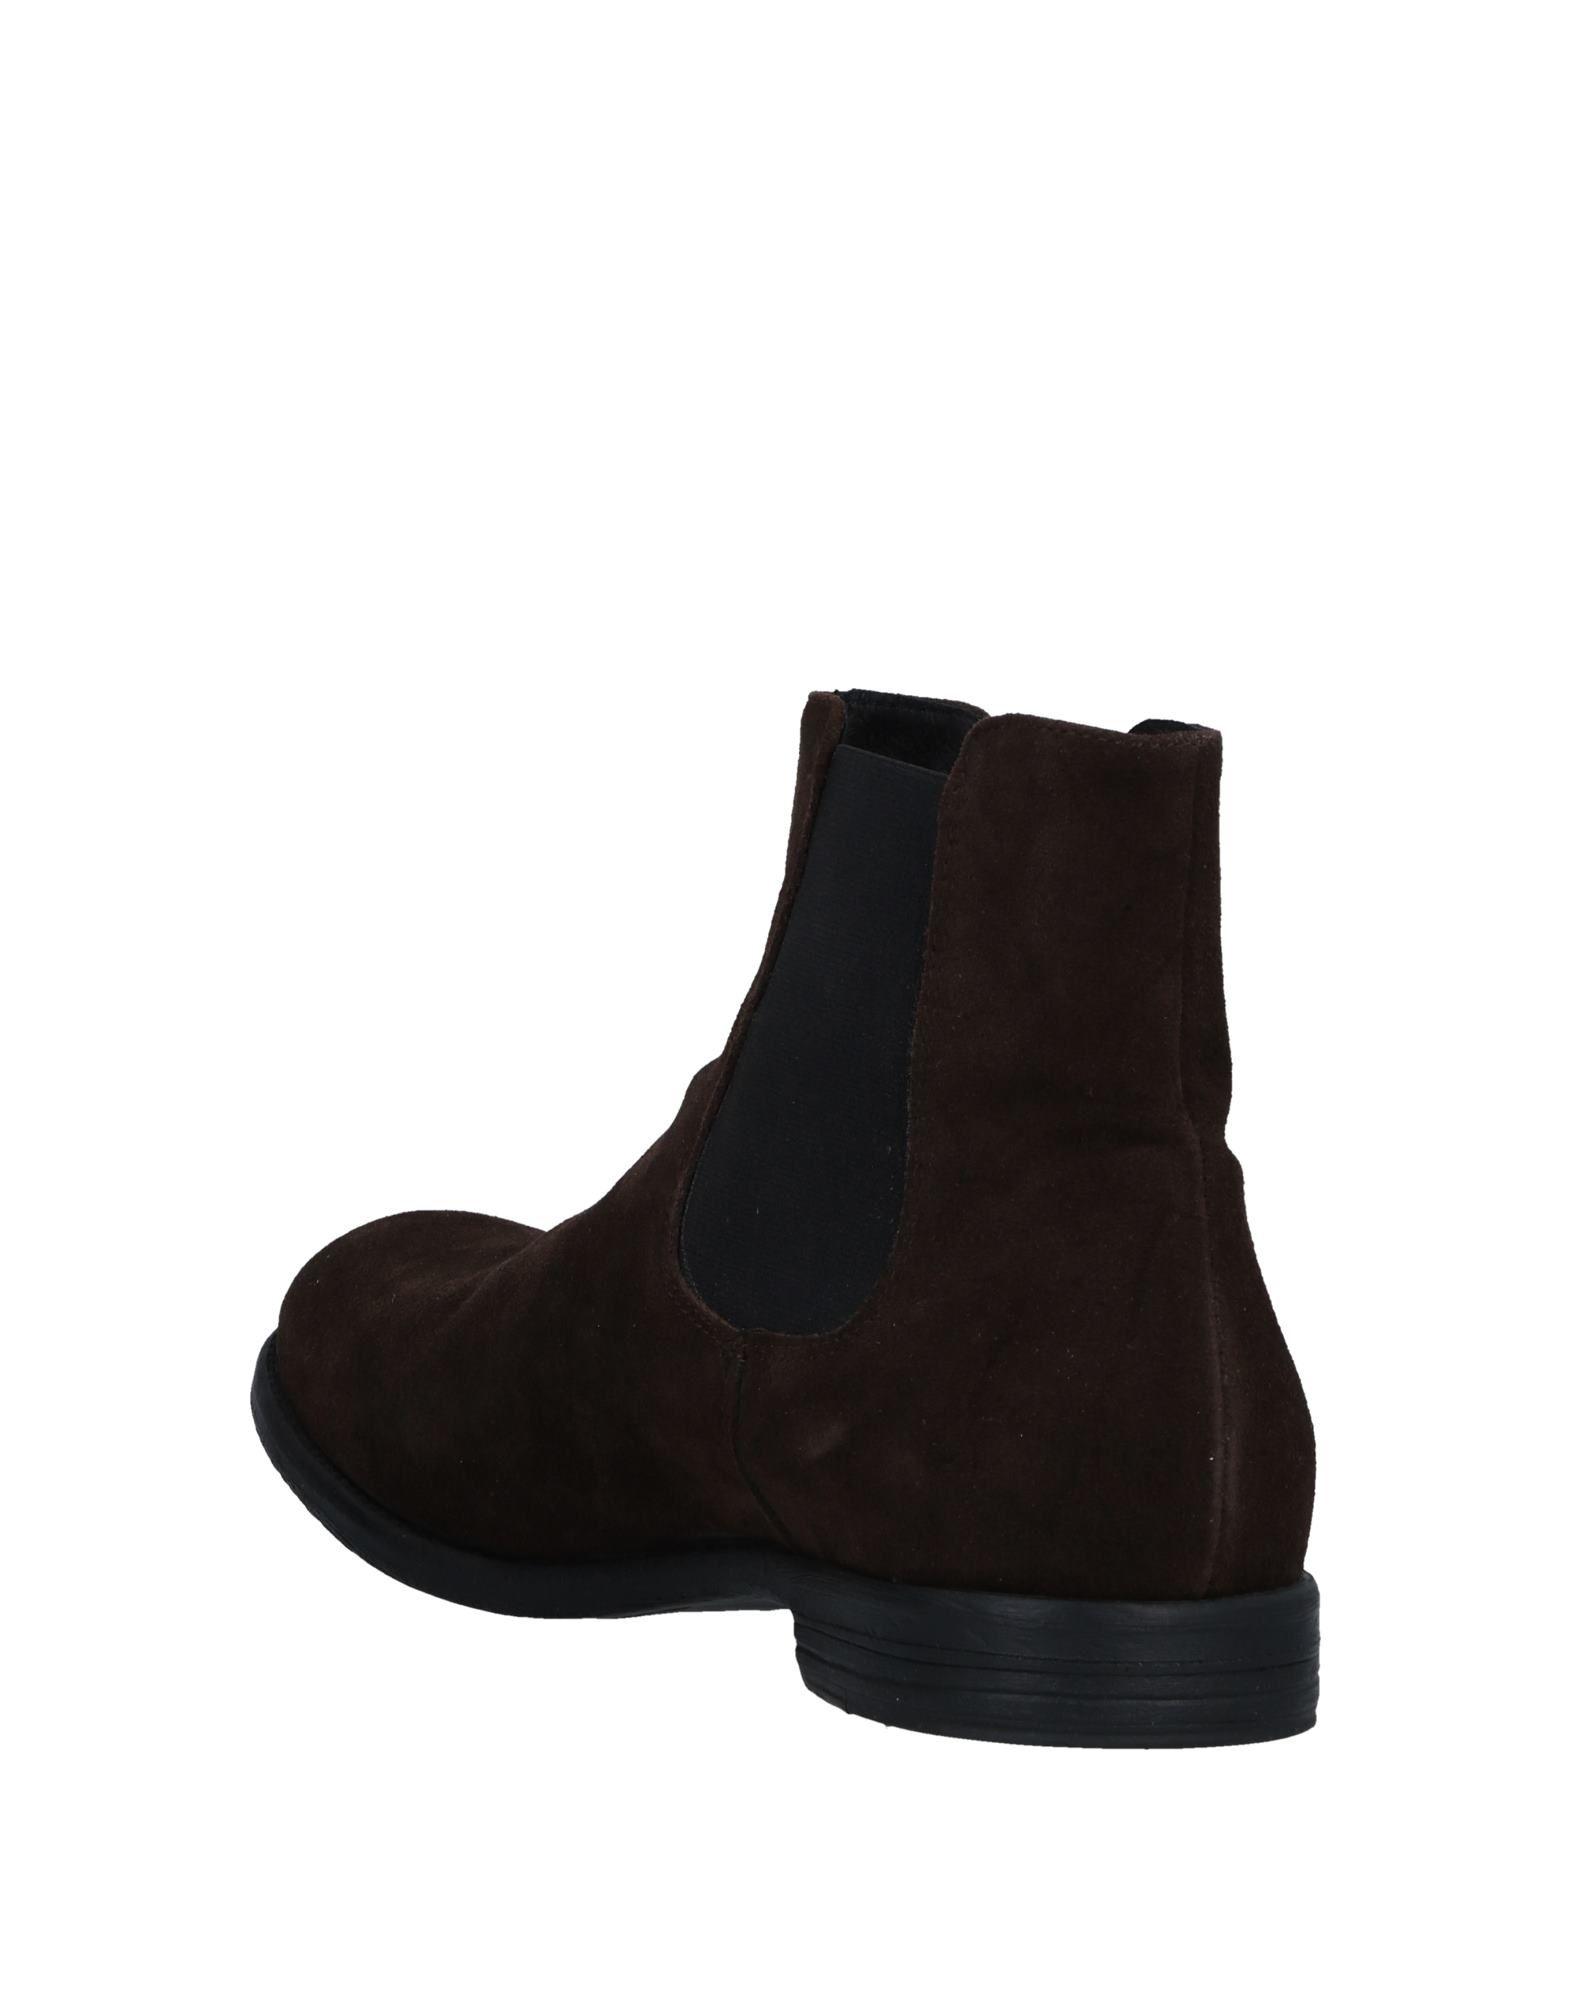 Rabatt echte Schuhe Officina 11510460TL 36 Stiefelette Herren  11510460TL Officina 4fee04